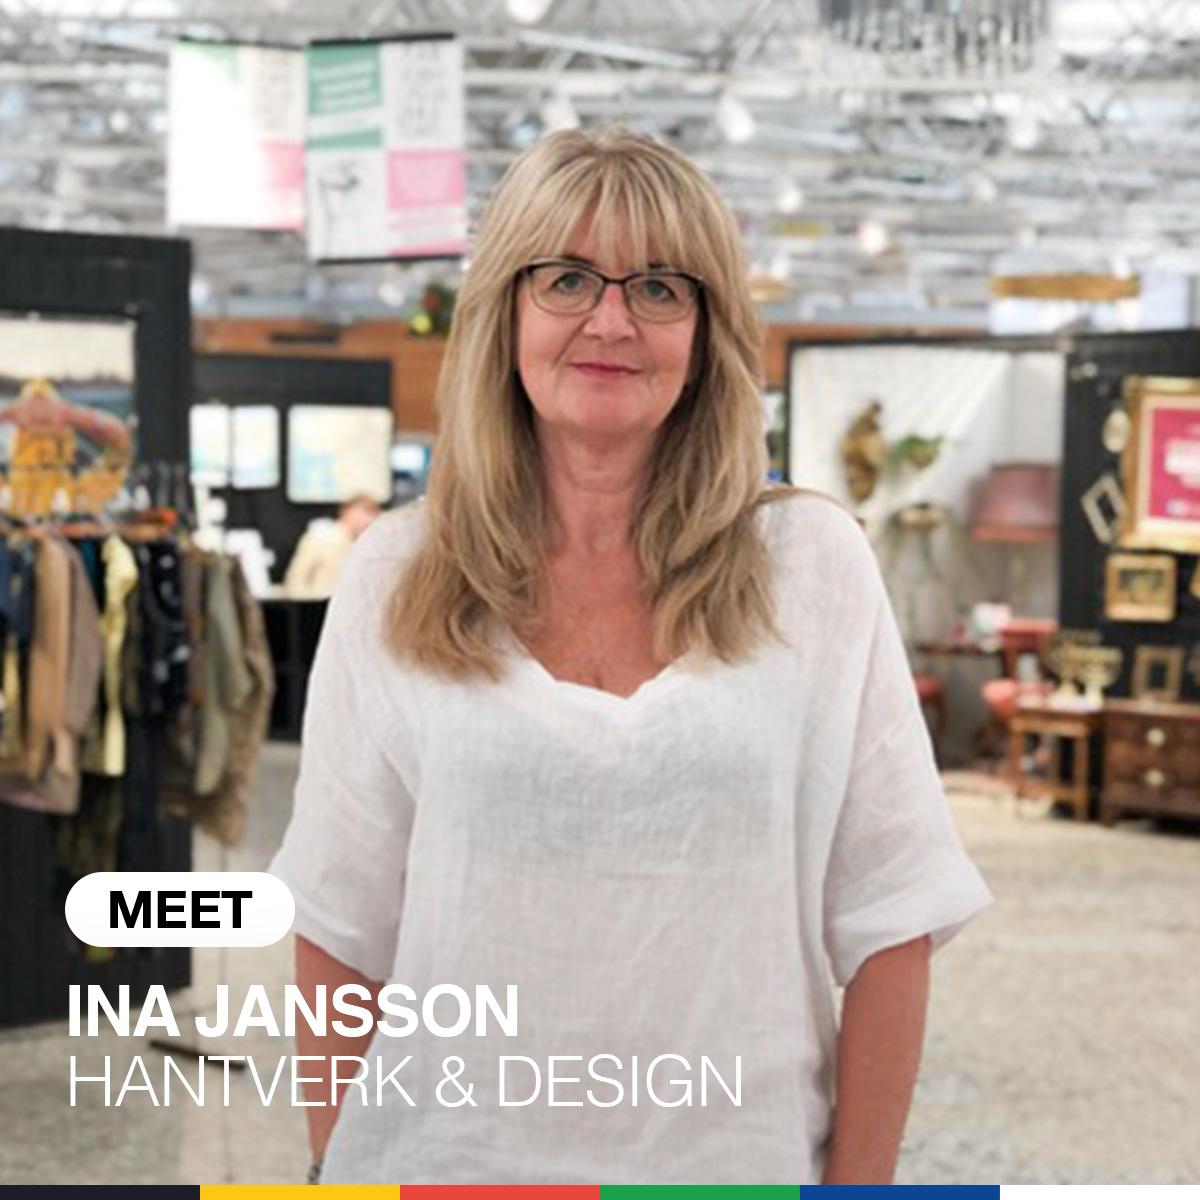 Ina Jansson, Hantverk & Design